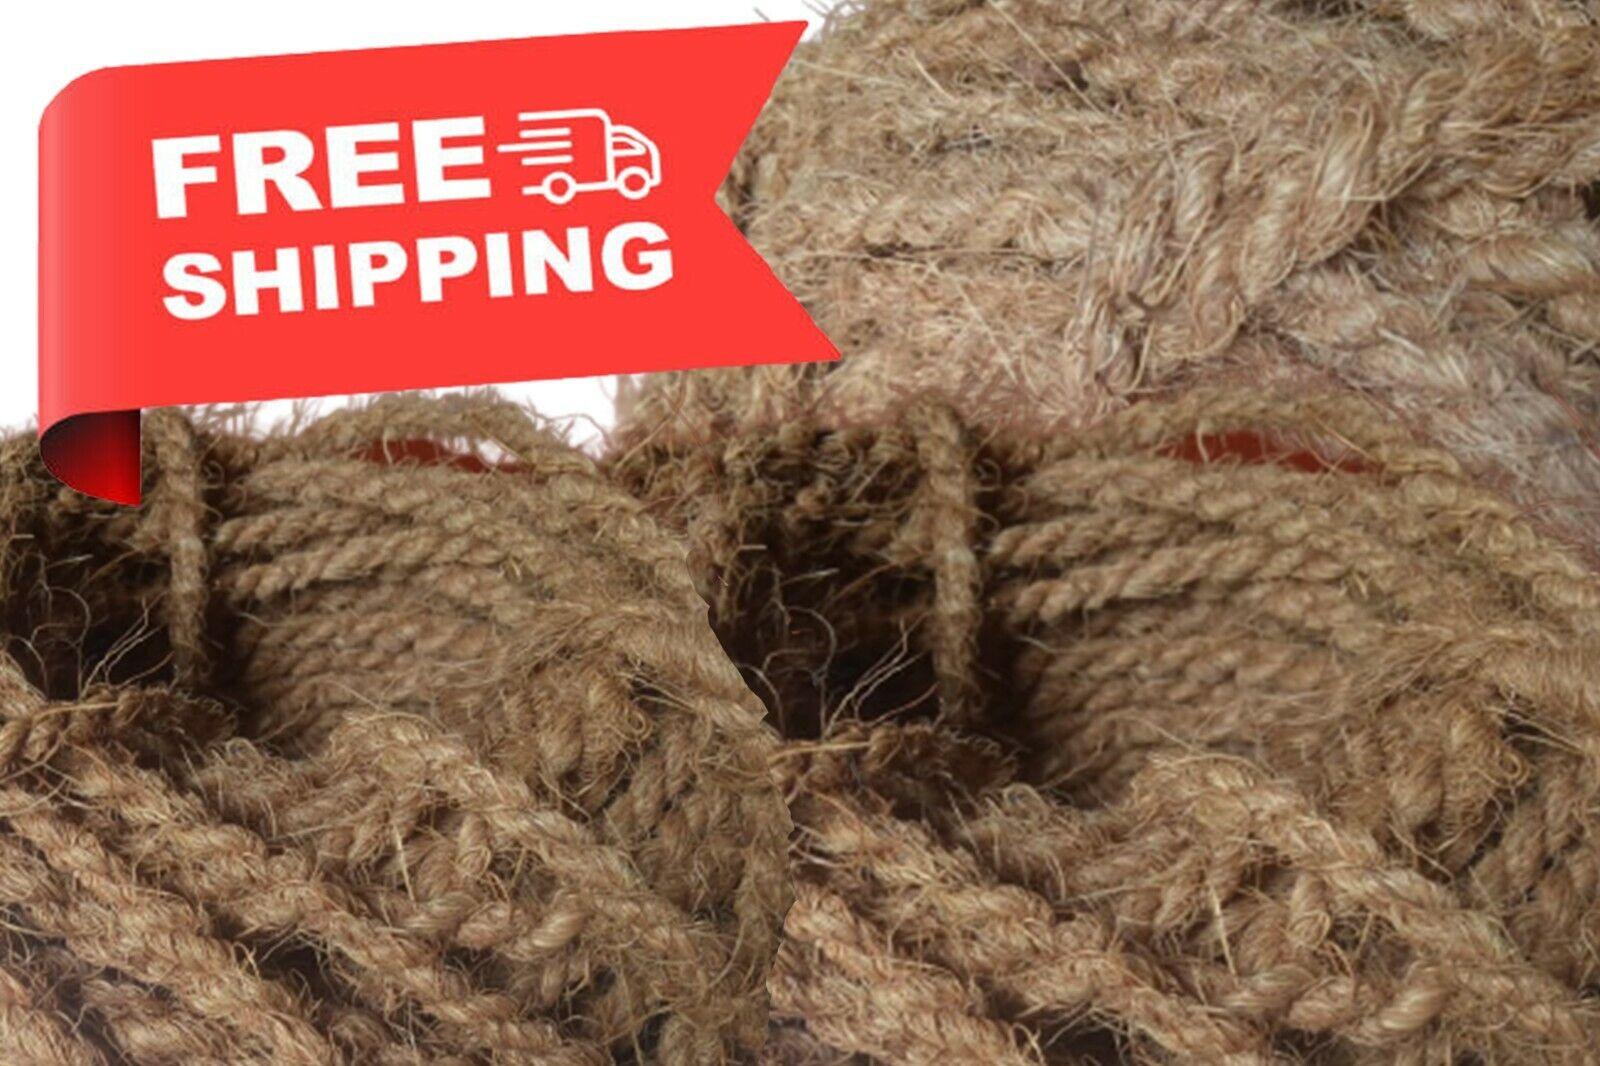 Coconut Coir Husk Fiber Rope Natural Handmade Twisted 100% Eco Friendly Hanging